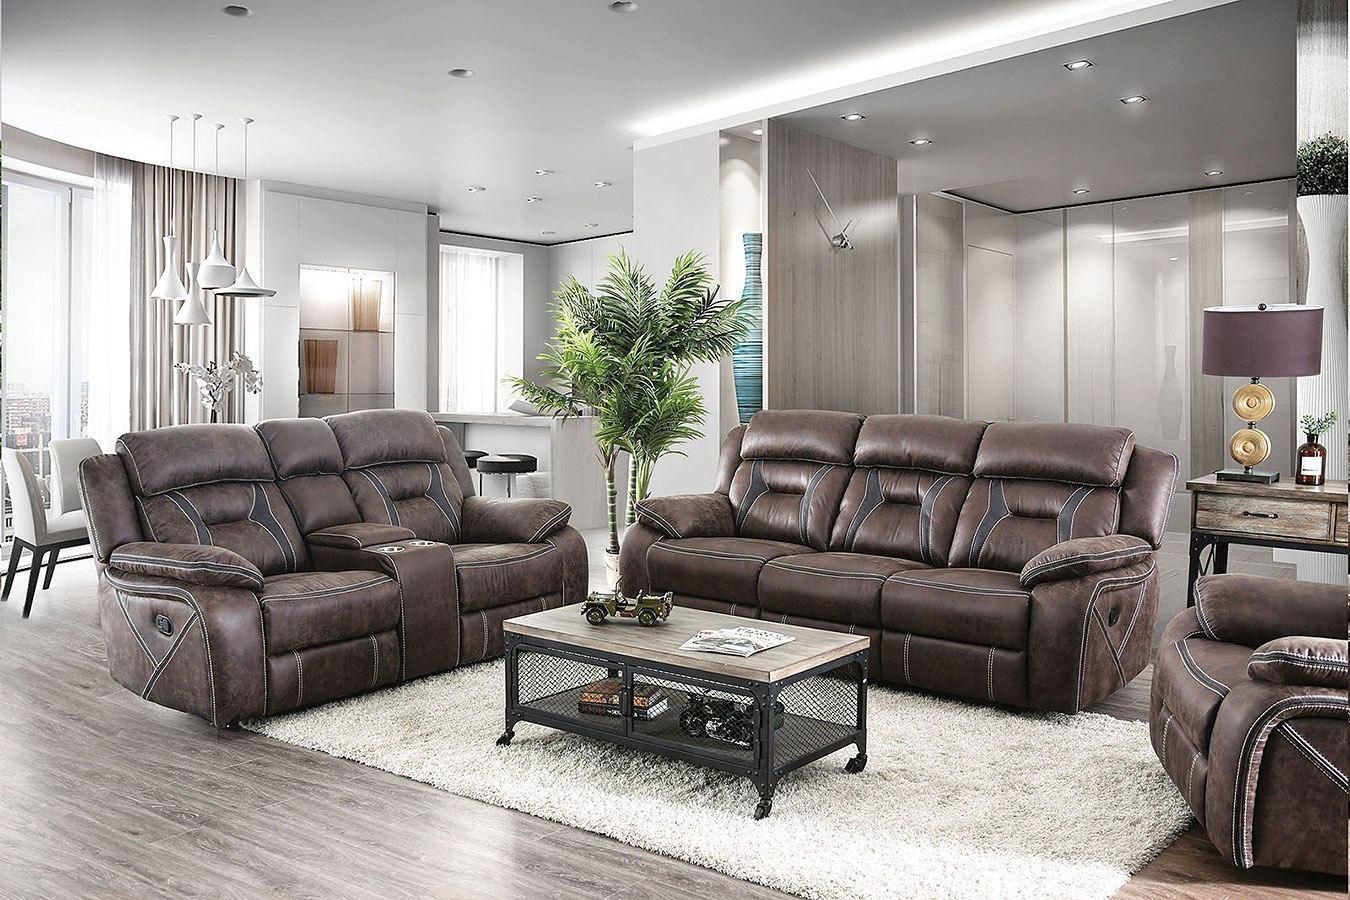 Flint Office Furniture: Flint Reclining Living Room Set By Furniture Of America